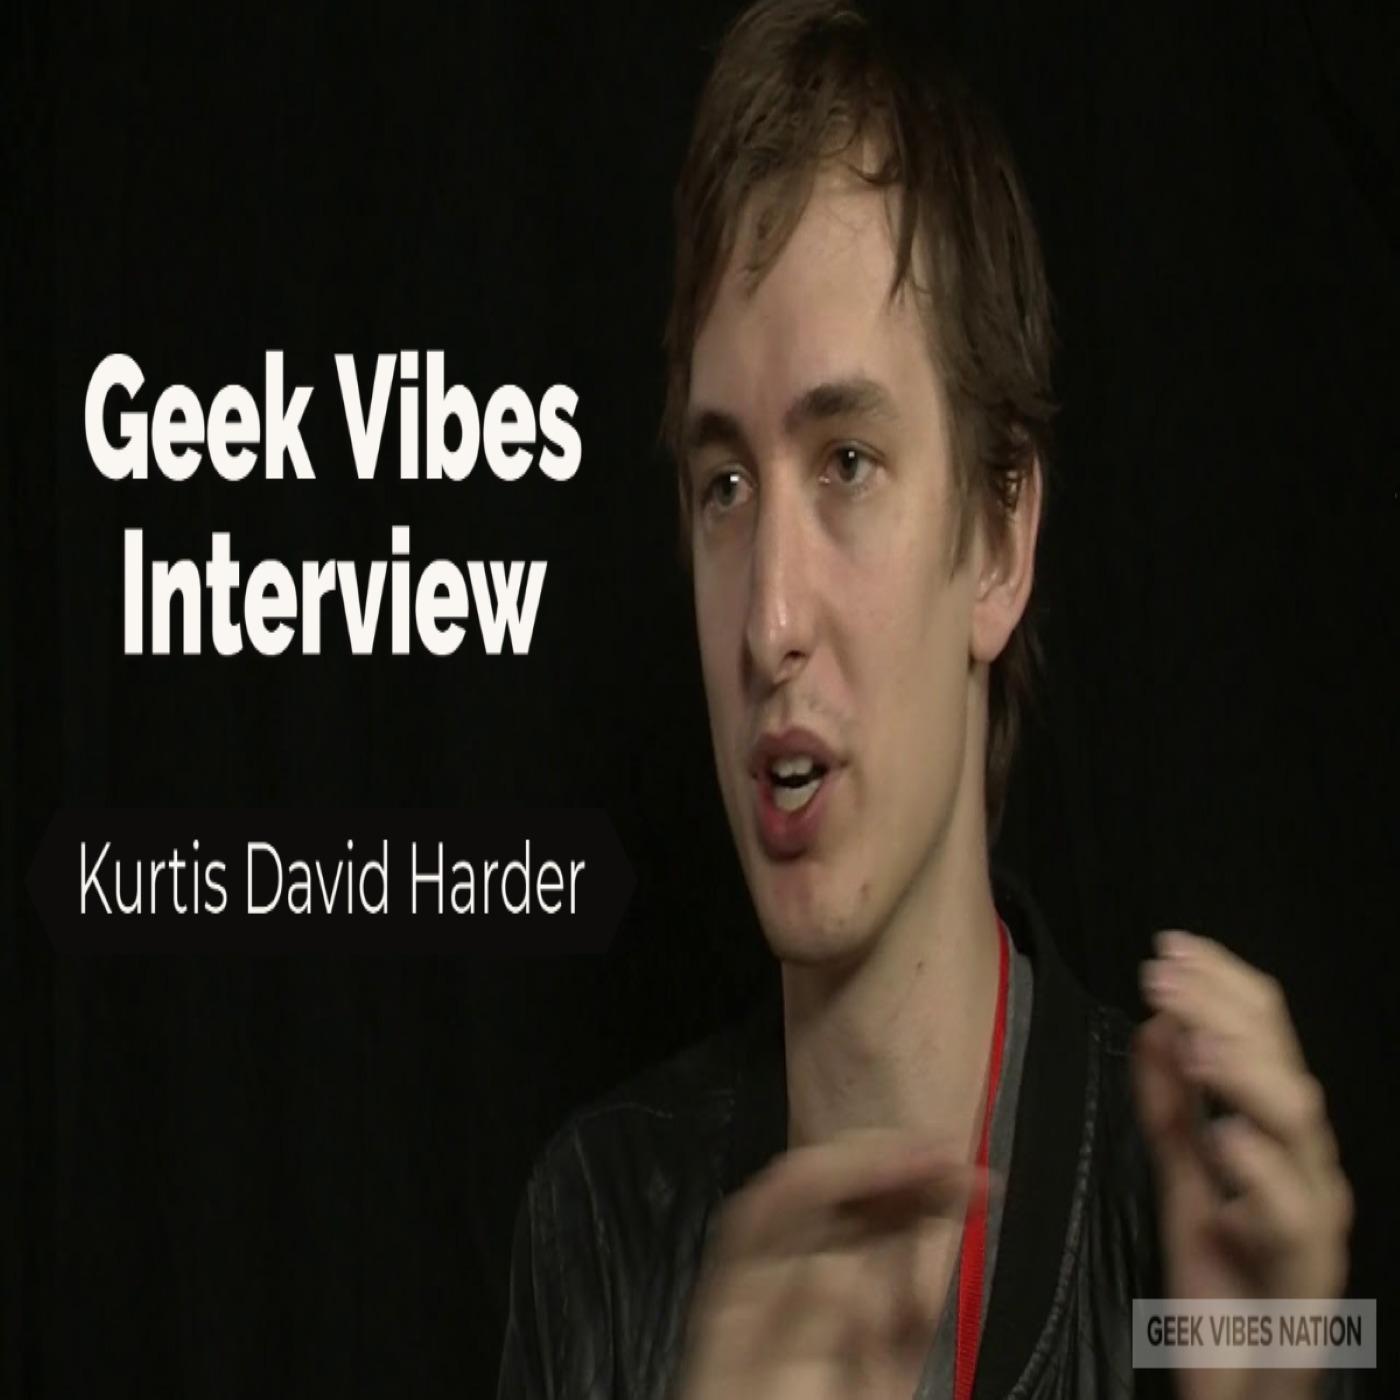 Geek Vibes Interview w/ Kurtis David Harder